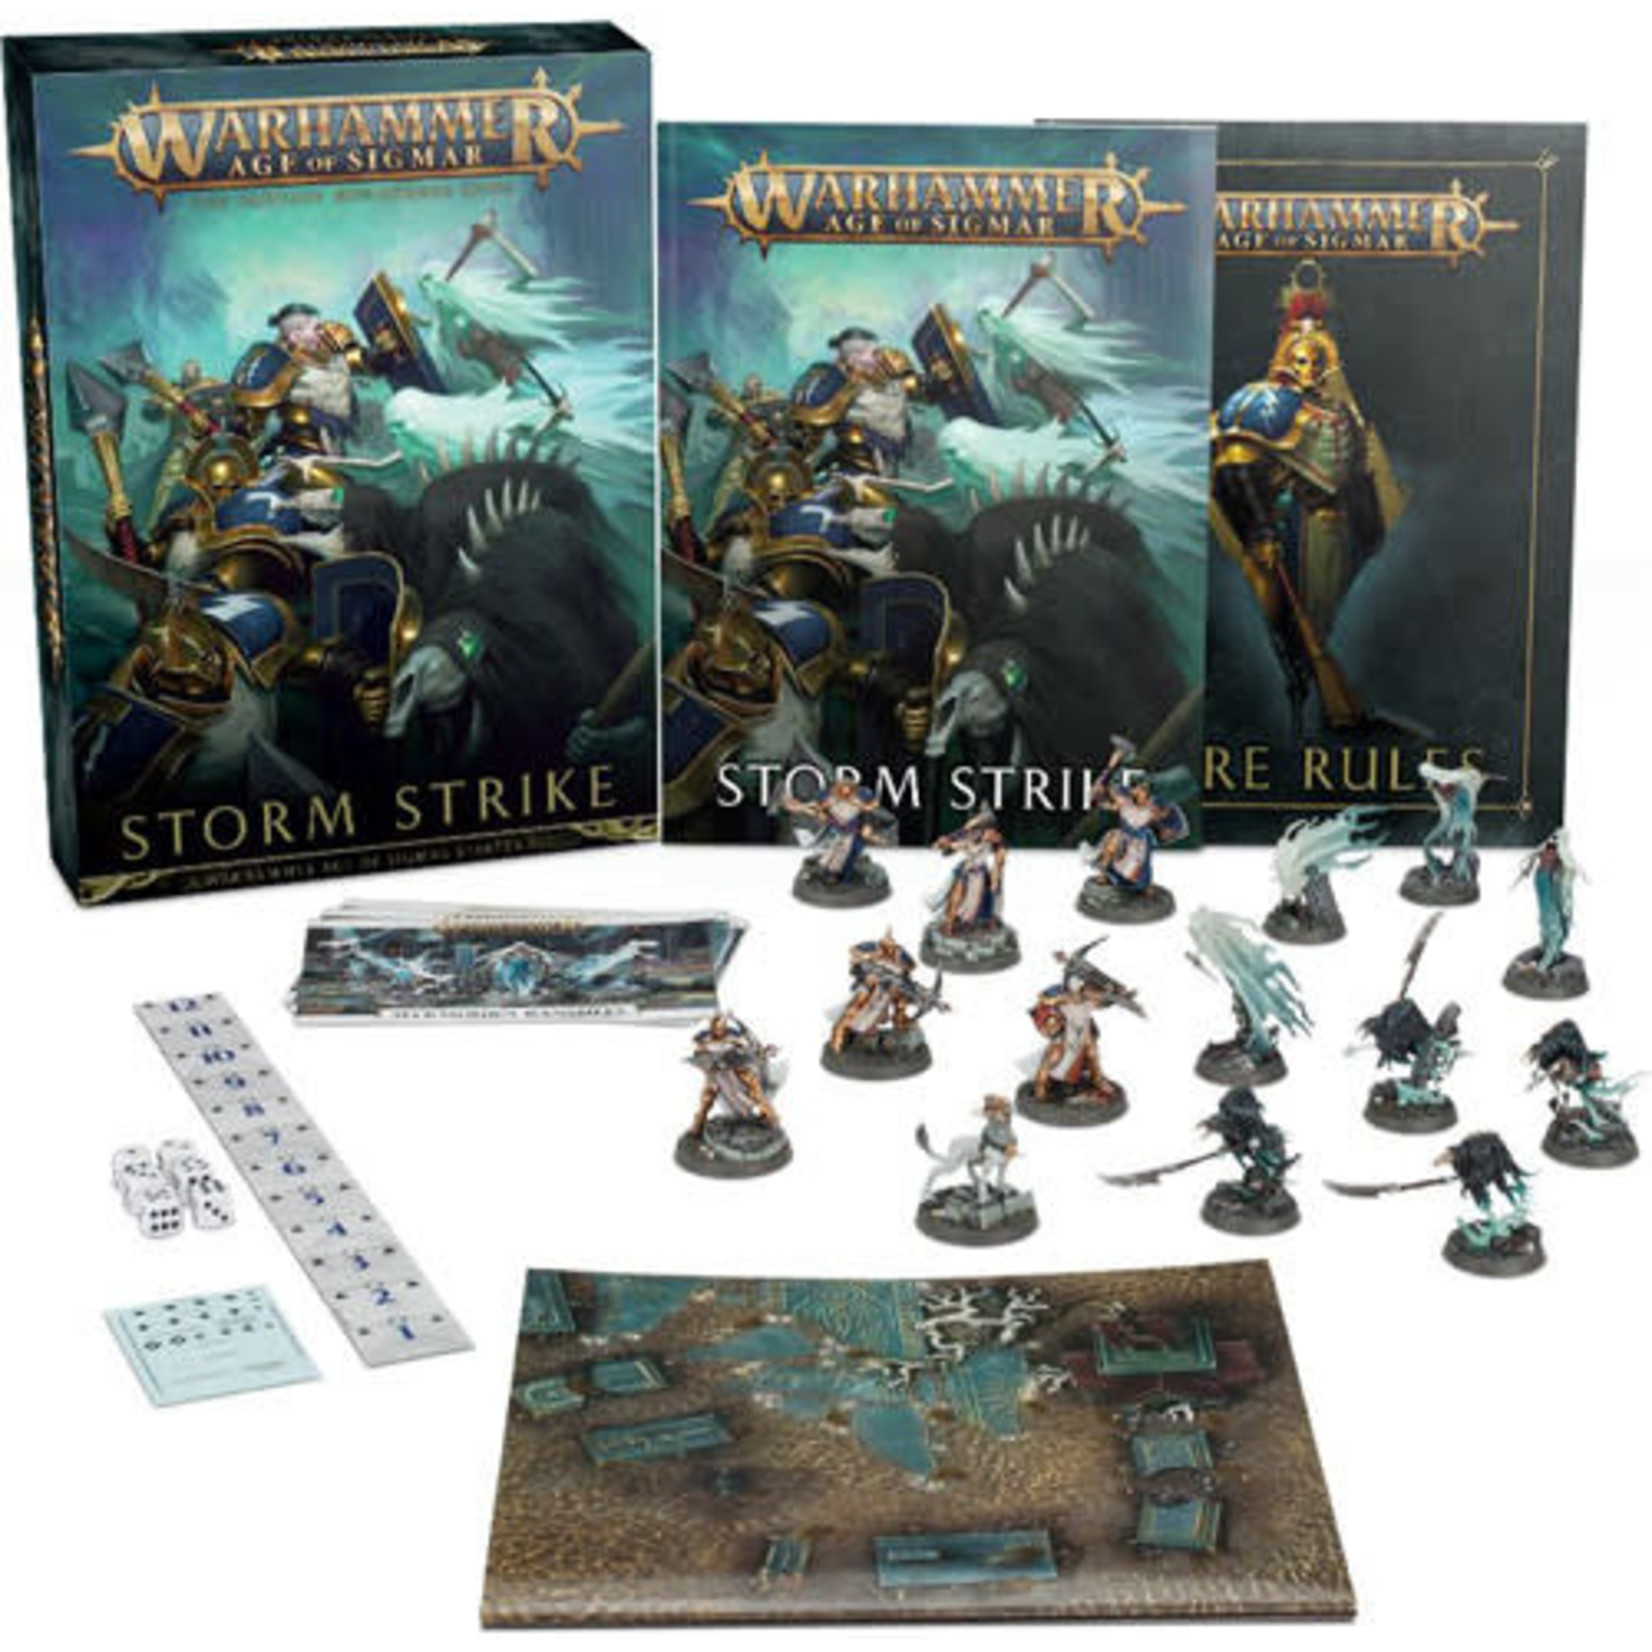 Games Workshop Warhammer Age of Sigmar: Storm Strike